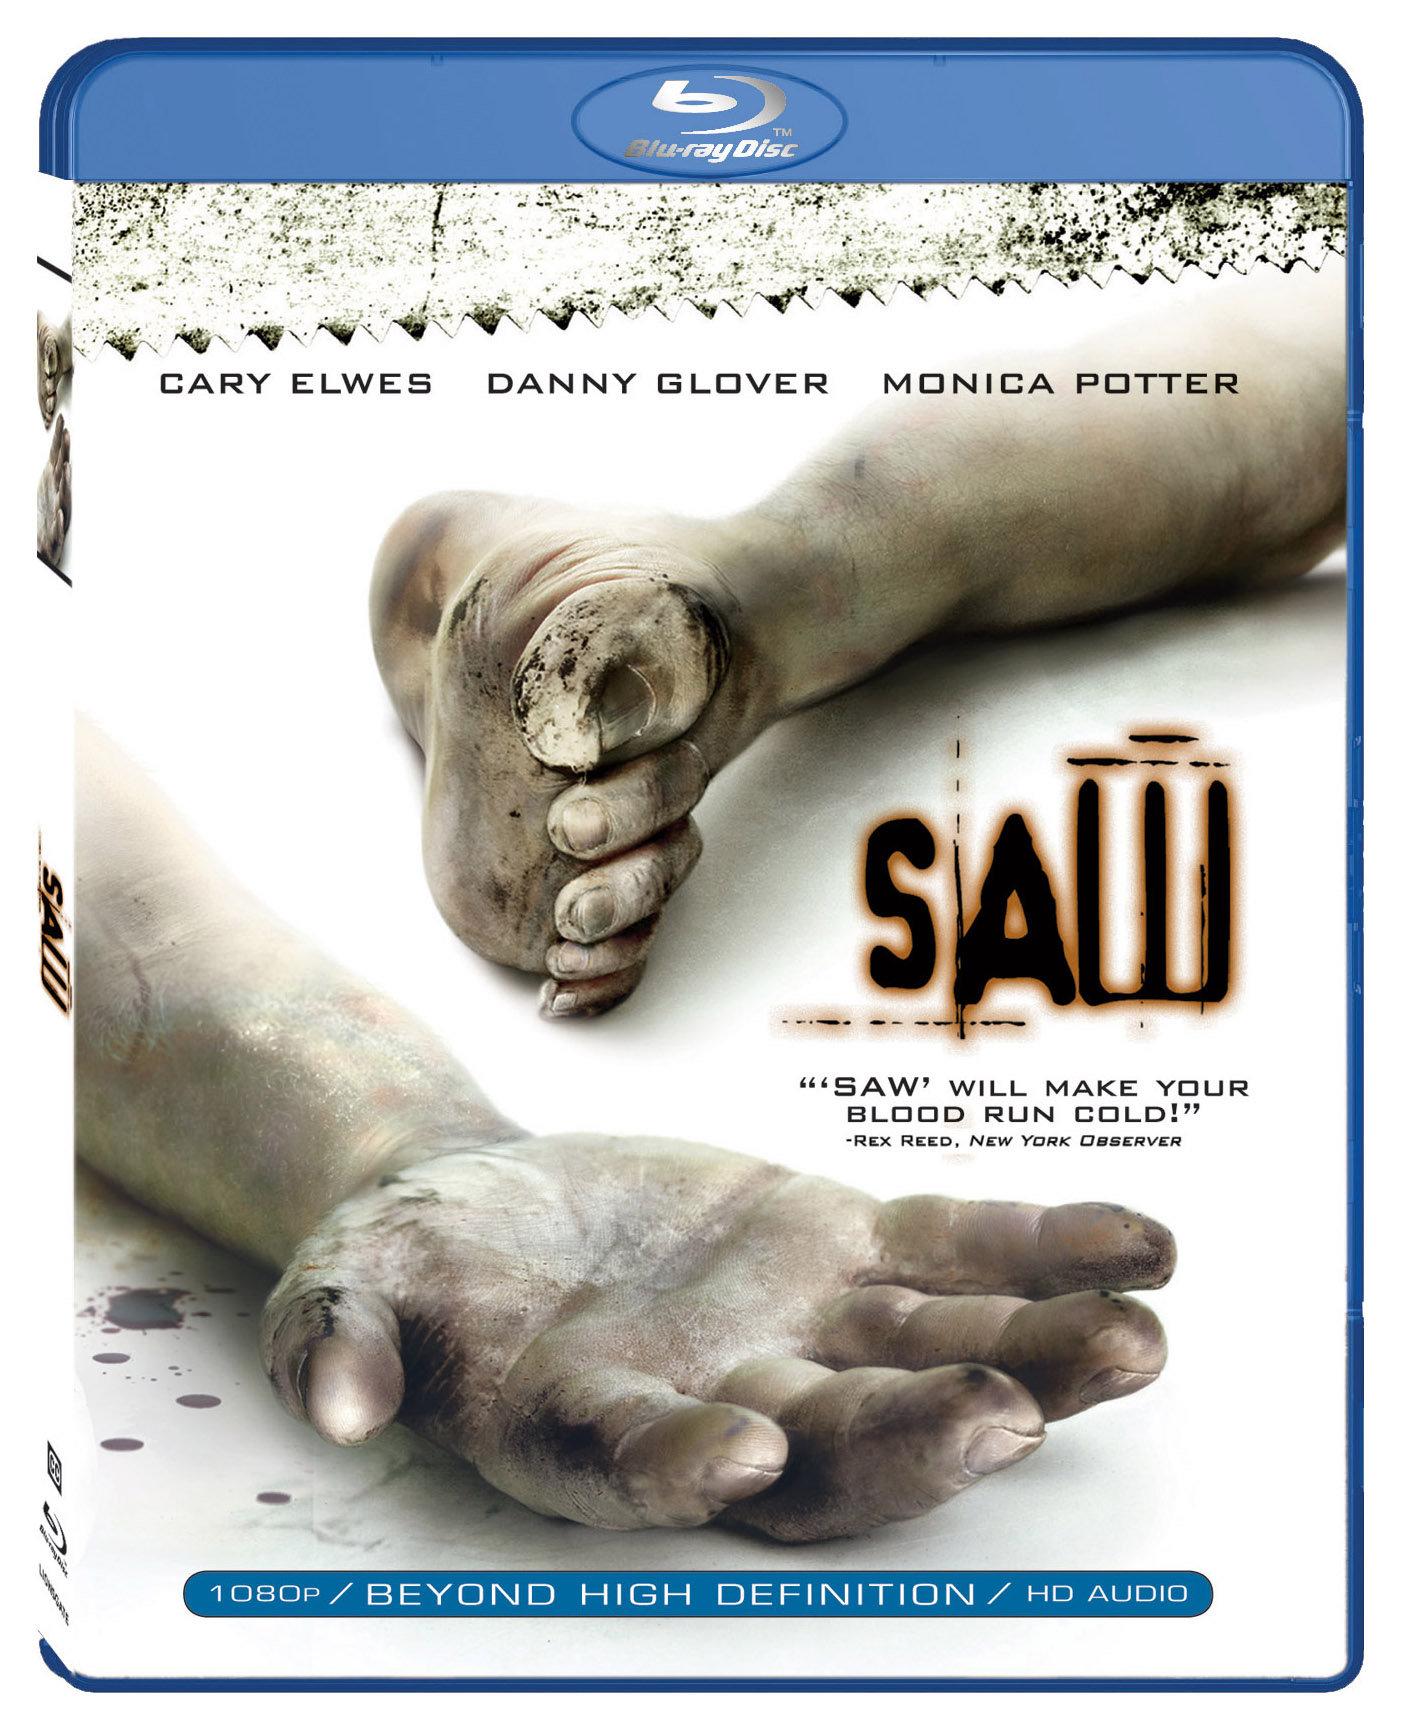 Saw poster image